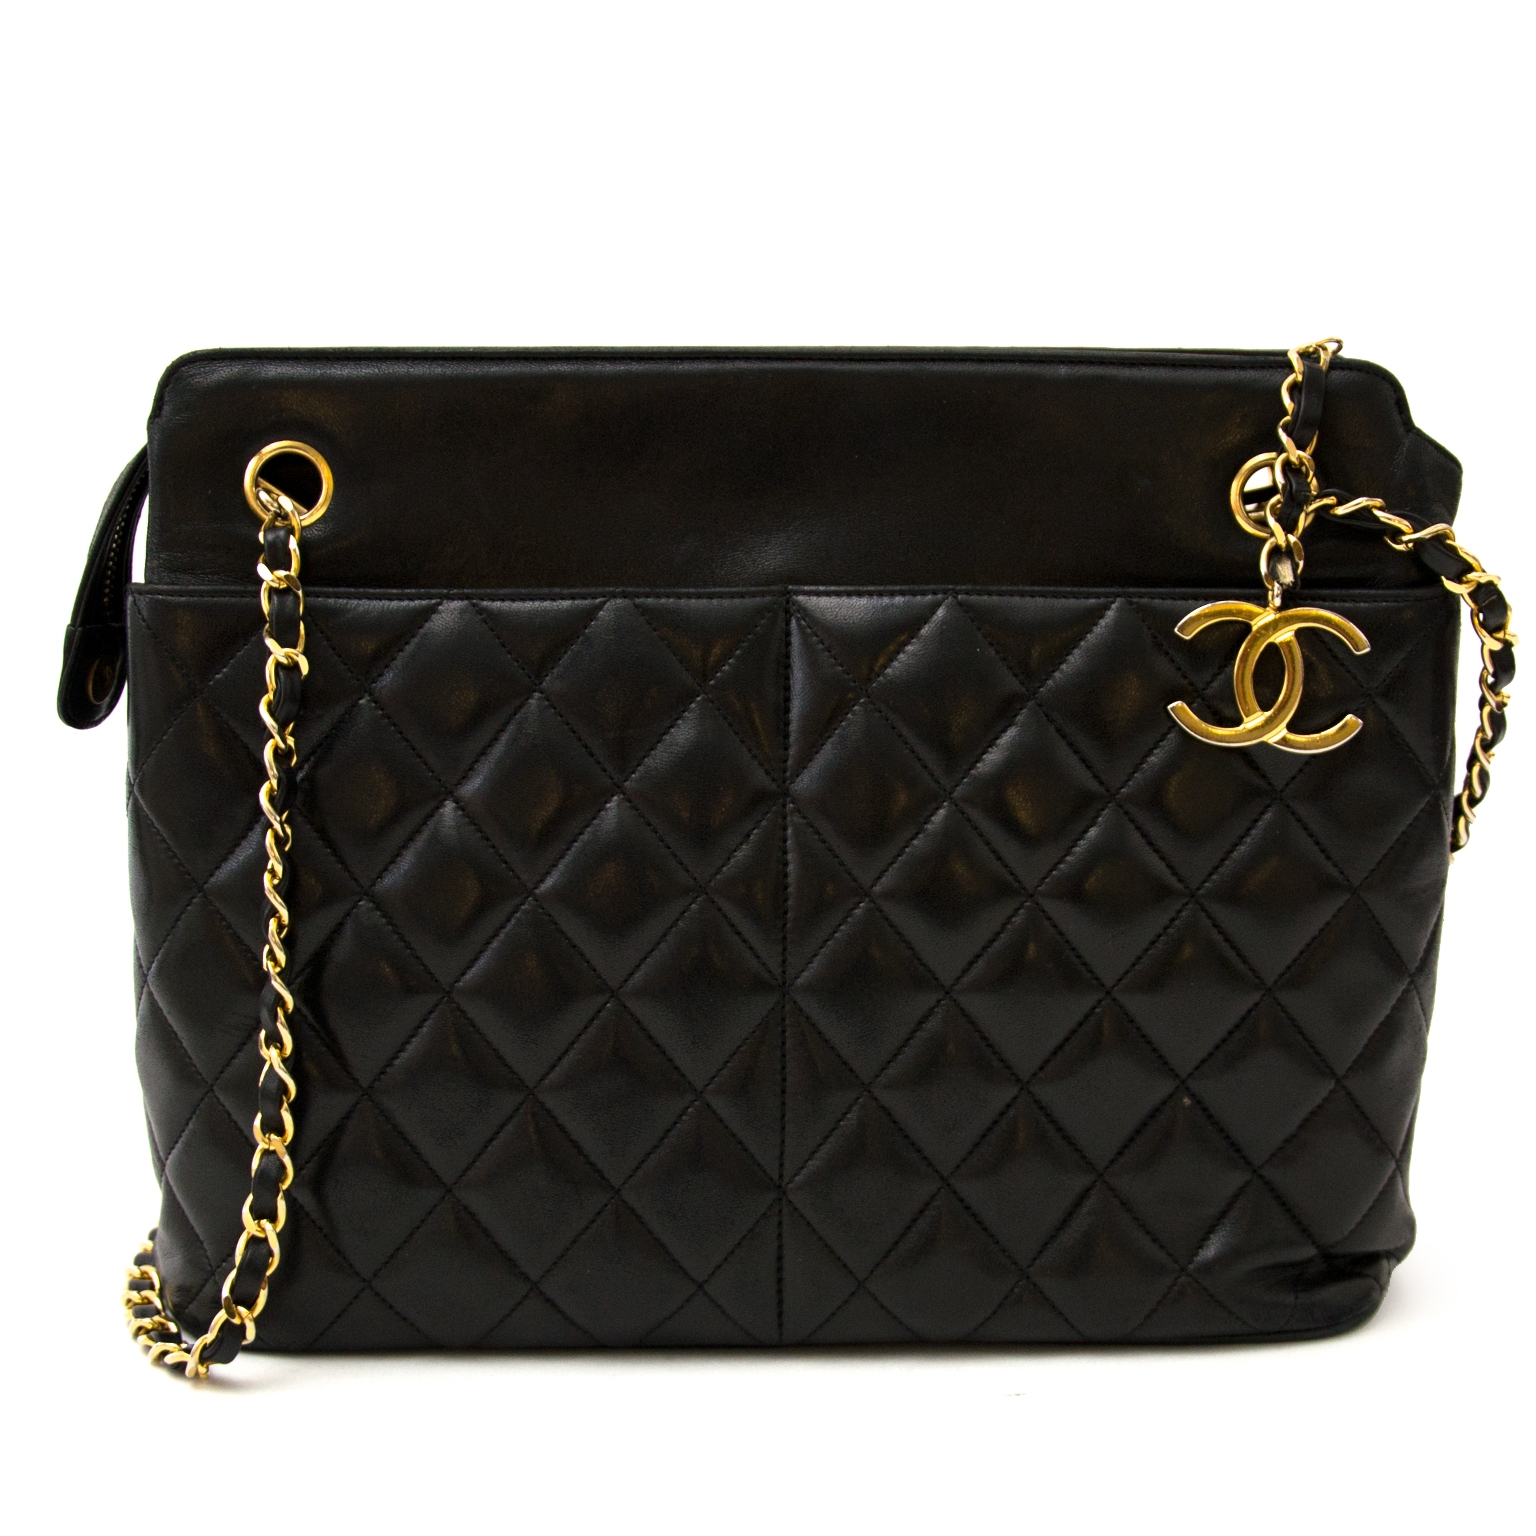 99b0ecbfc90bb5 ... koop Chanel Black Vintage Lambskin Shopper bij labellov en betaal  veilig online